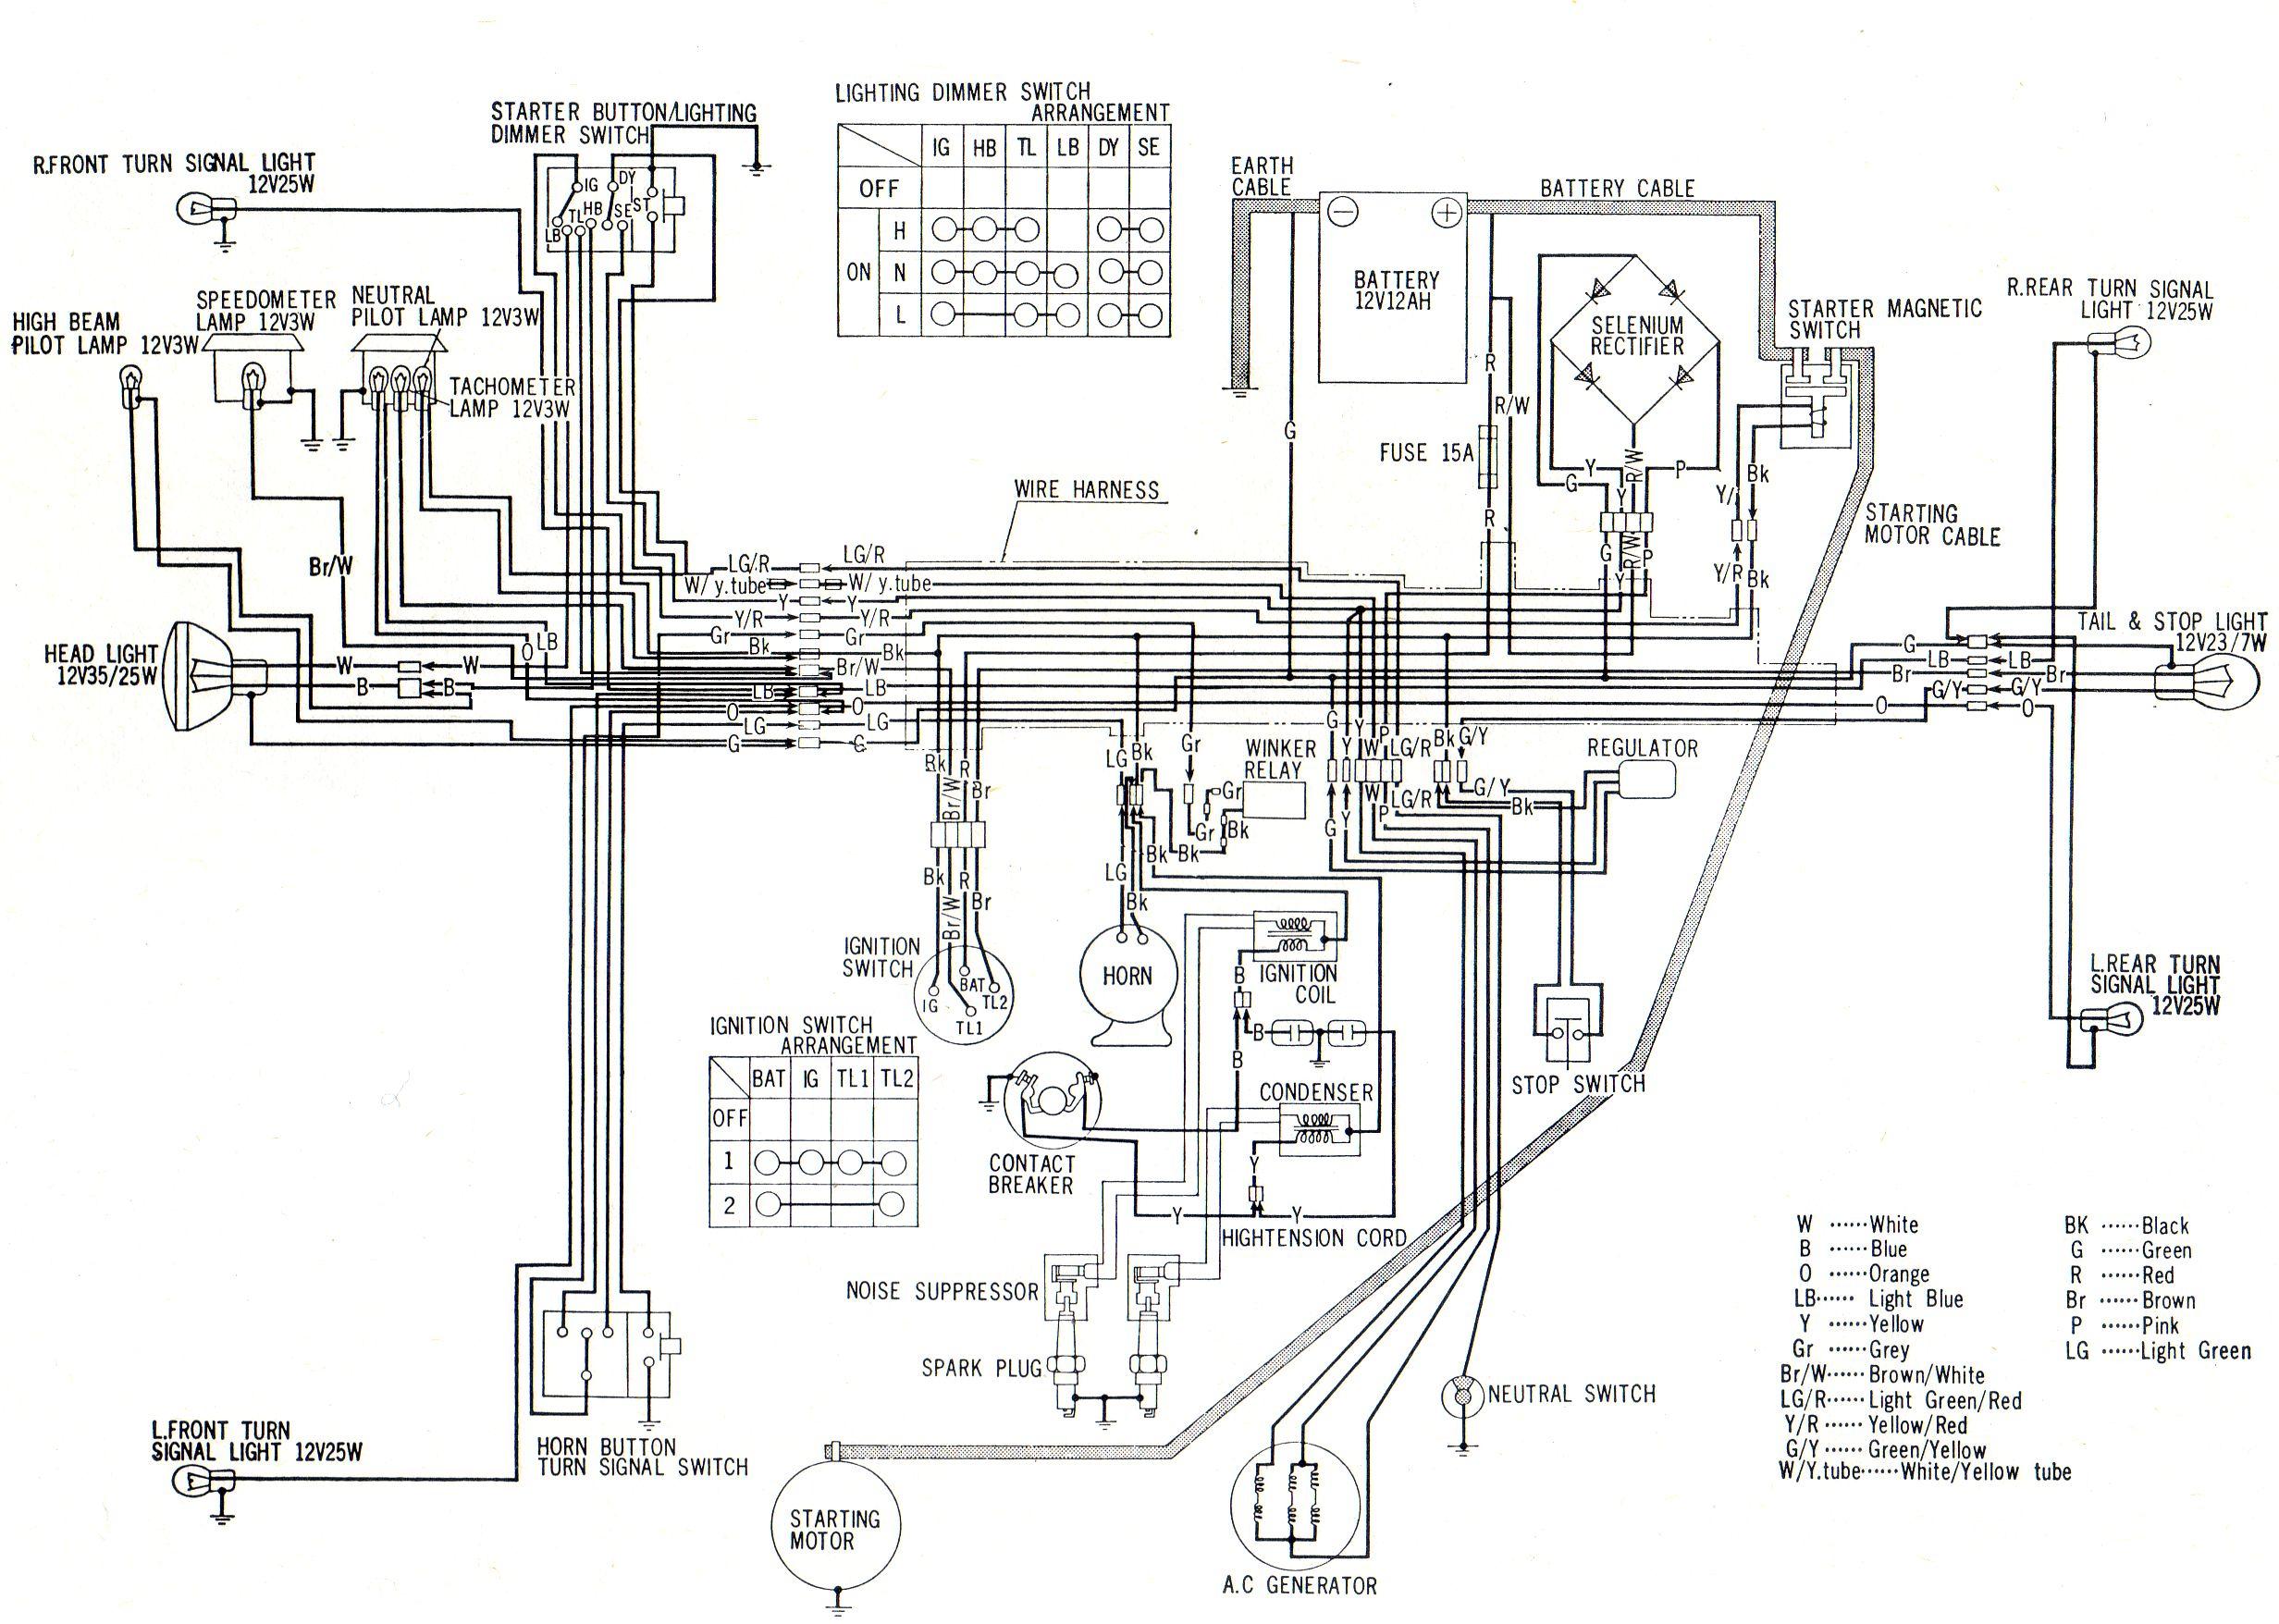 DIAGRAM] Old Black Wiring Diagram FULL Version HD Quality Wiring Diagram -  LOVEDIAGRAM.MERVILLEJESOLO.IT | Aermacchi Wiring Diagram 65 |  | Diagram Database